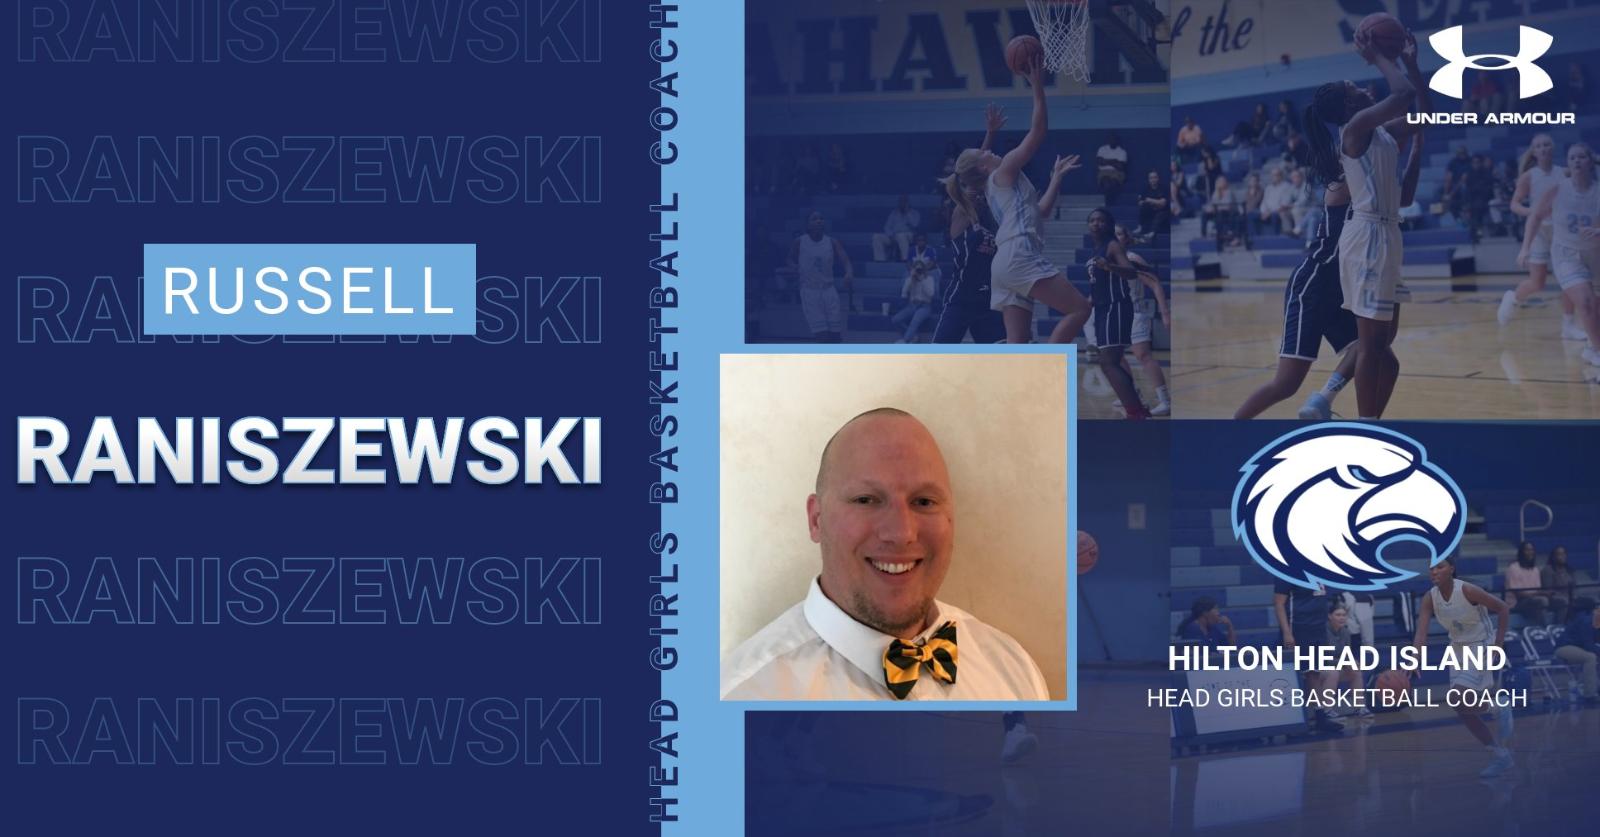 Seahawks hire Russell Raniszewski to lead Girls Basketball Program